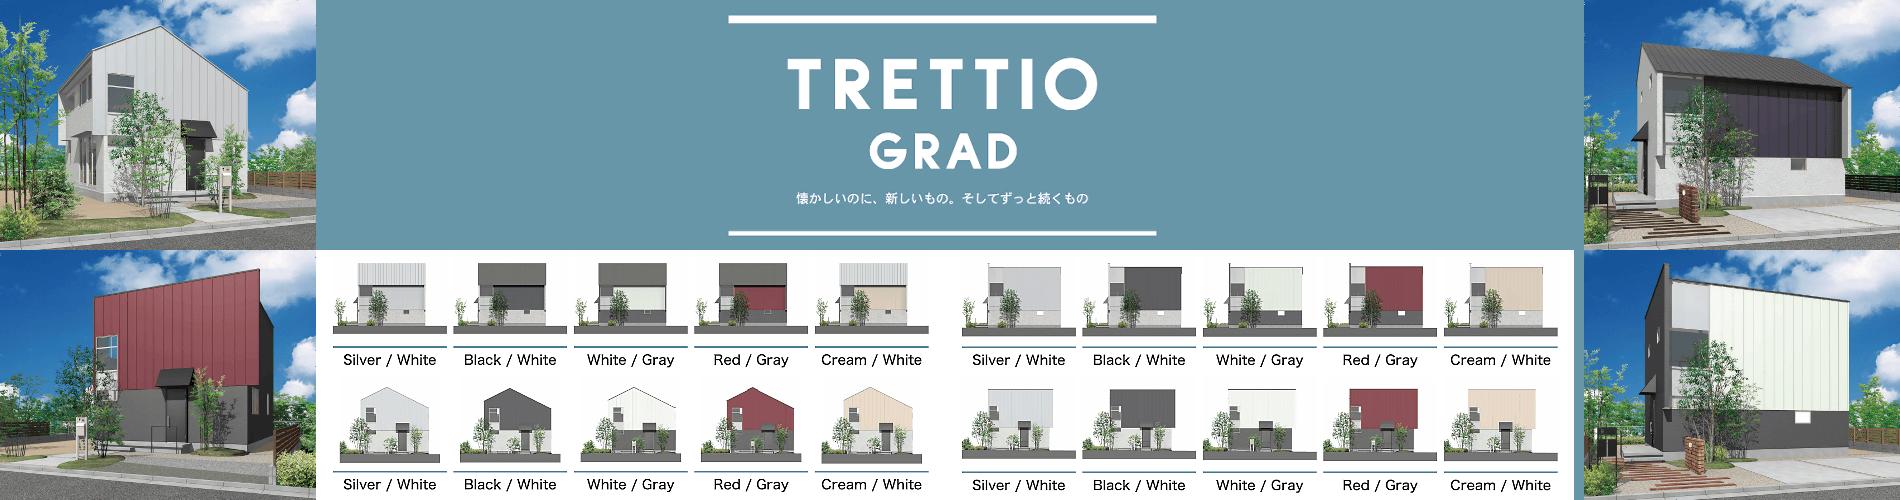 TRETTIO-GRAD(田村市の新築住宅・注文住宅・リフォーム、田村産業株式会社)2